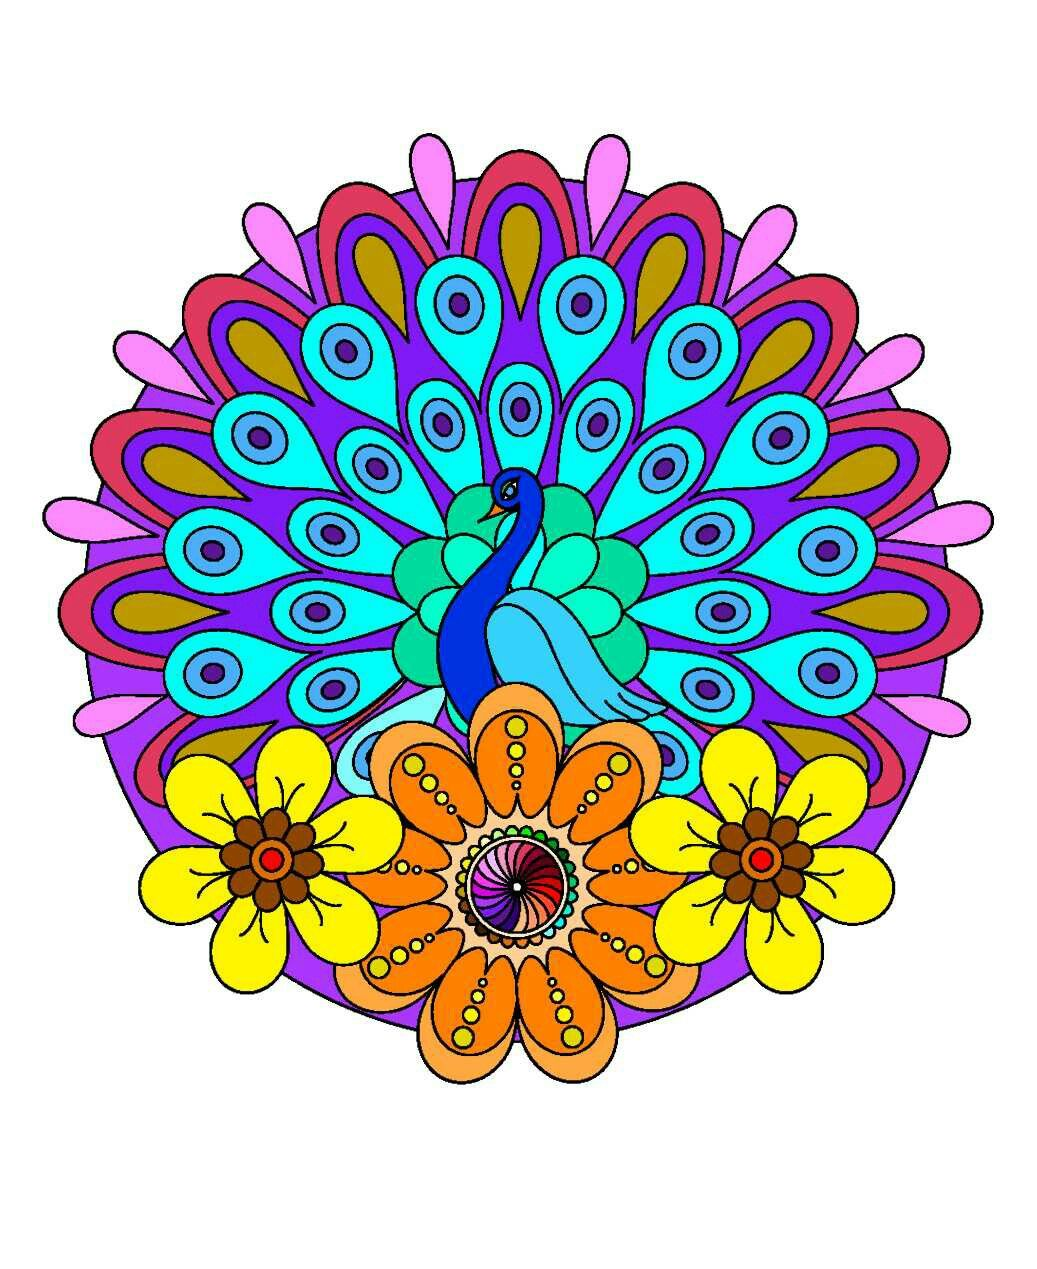 Pavo Real   Mandala coloring book   Pinterest   Colorear